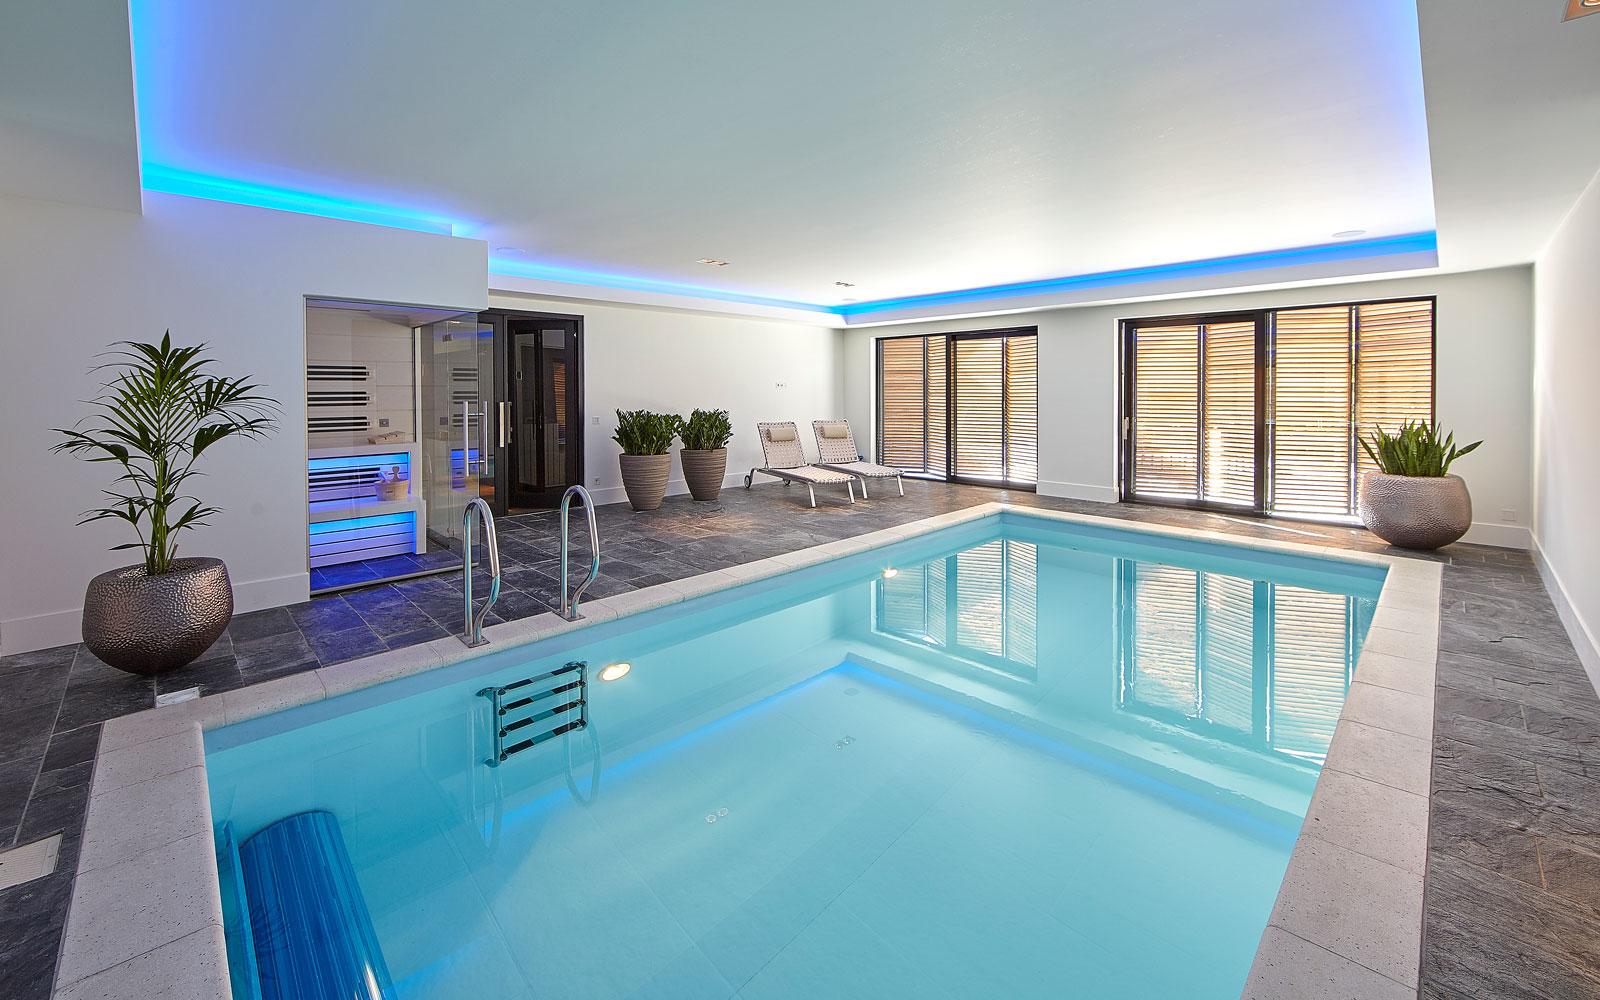 Binnenzwembad, zwembad, VSB Wellness, wellness, ultramoderne villa, Bob Manders